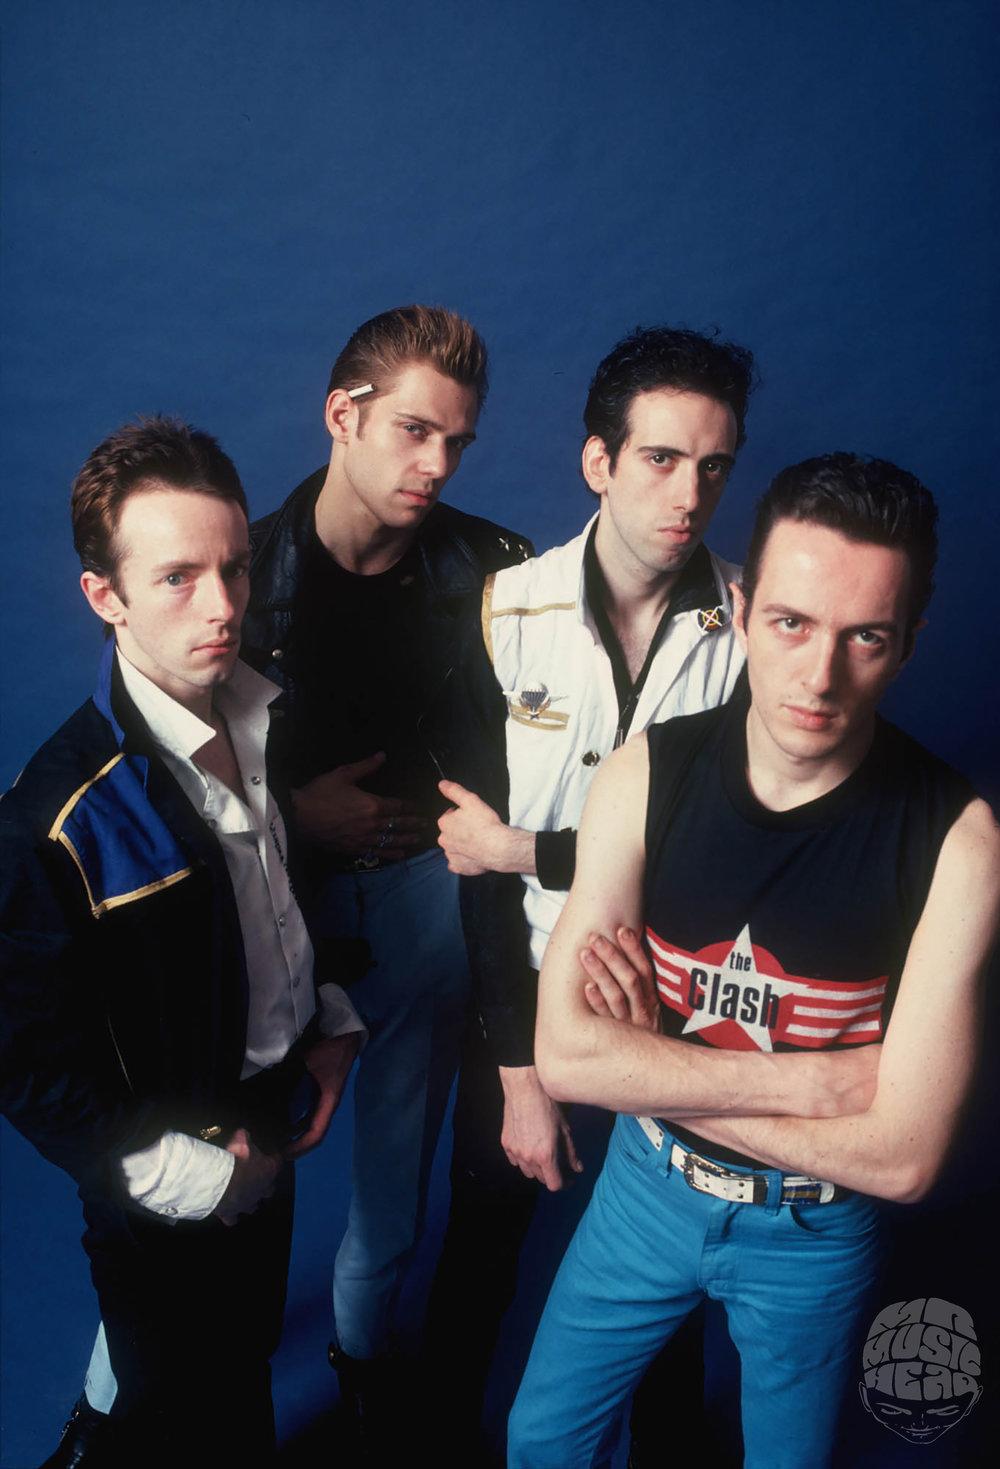 allan tannenbaum_The Clash Studio.jpg